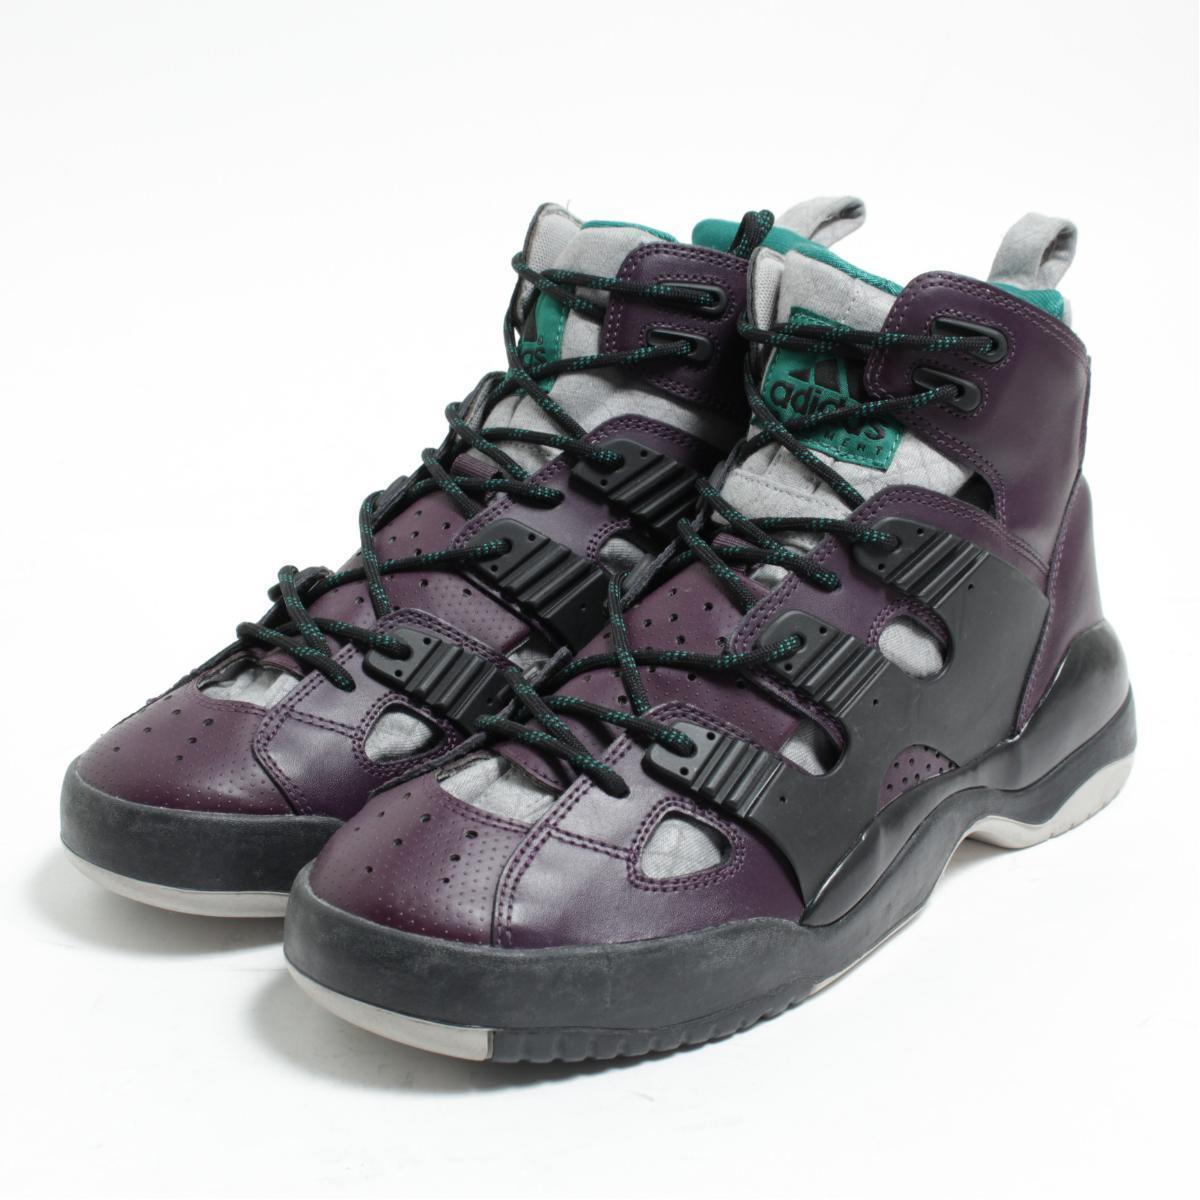 Adidas adidas EQT BASKETBALL sneakers US9 men 27.0cm bom1874